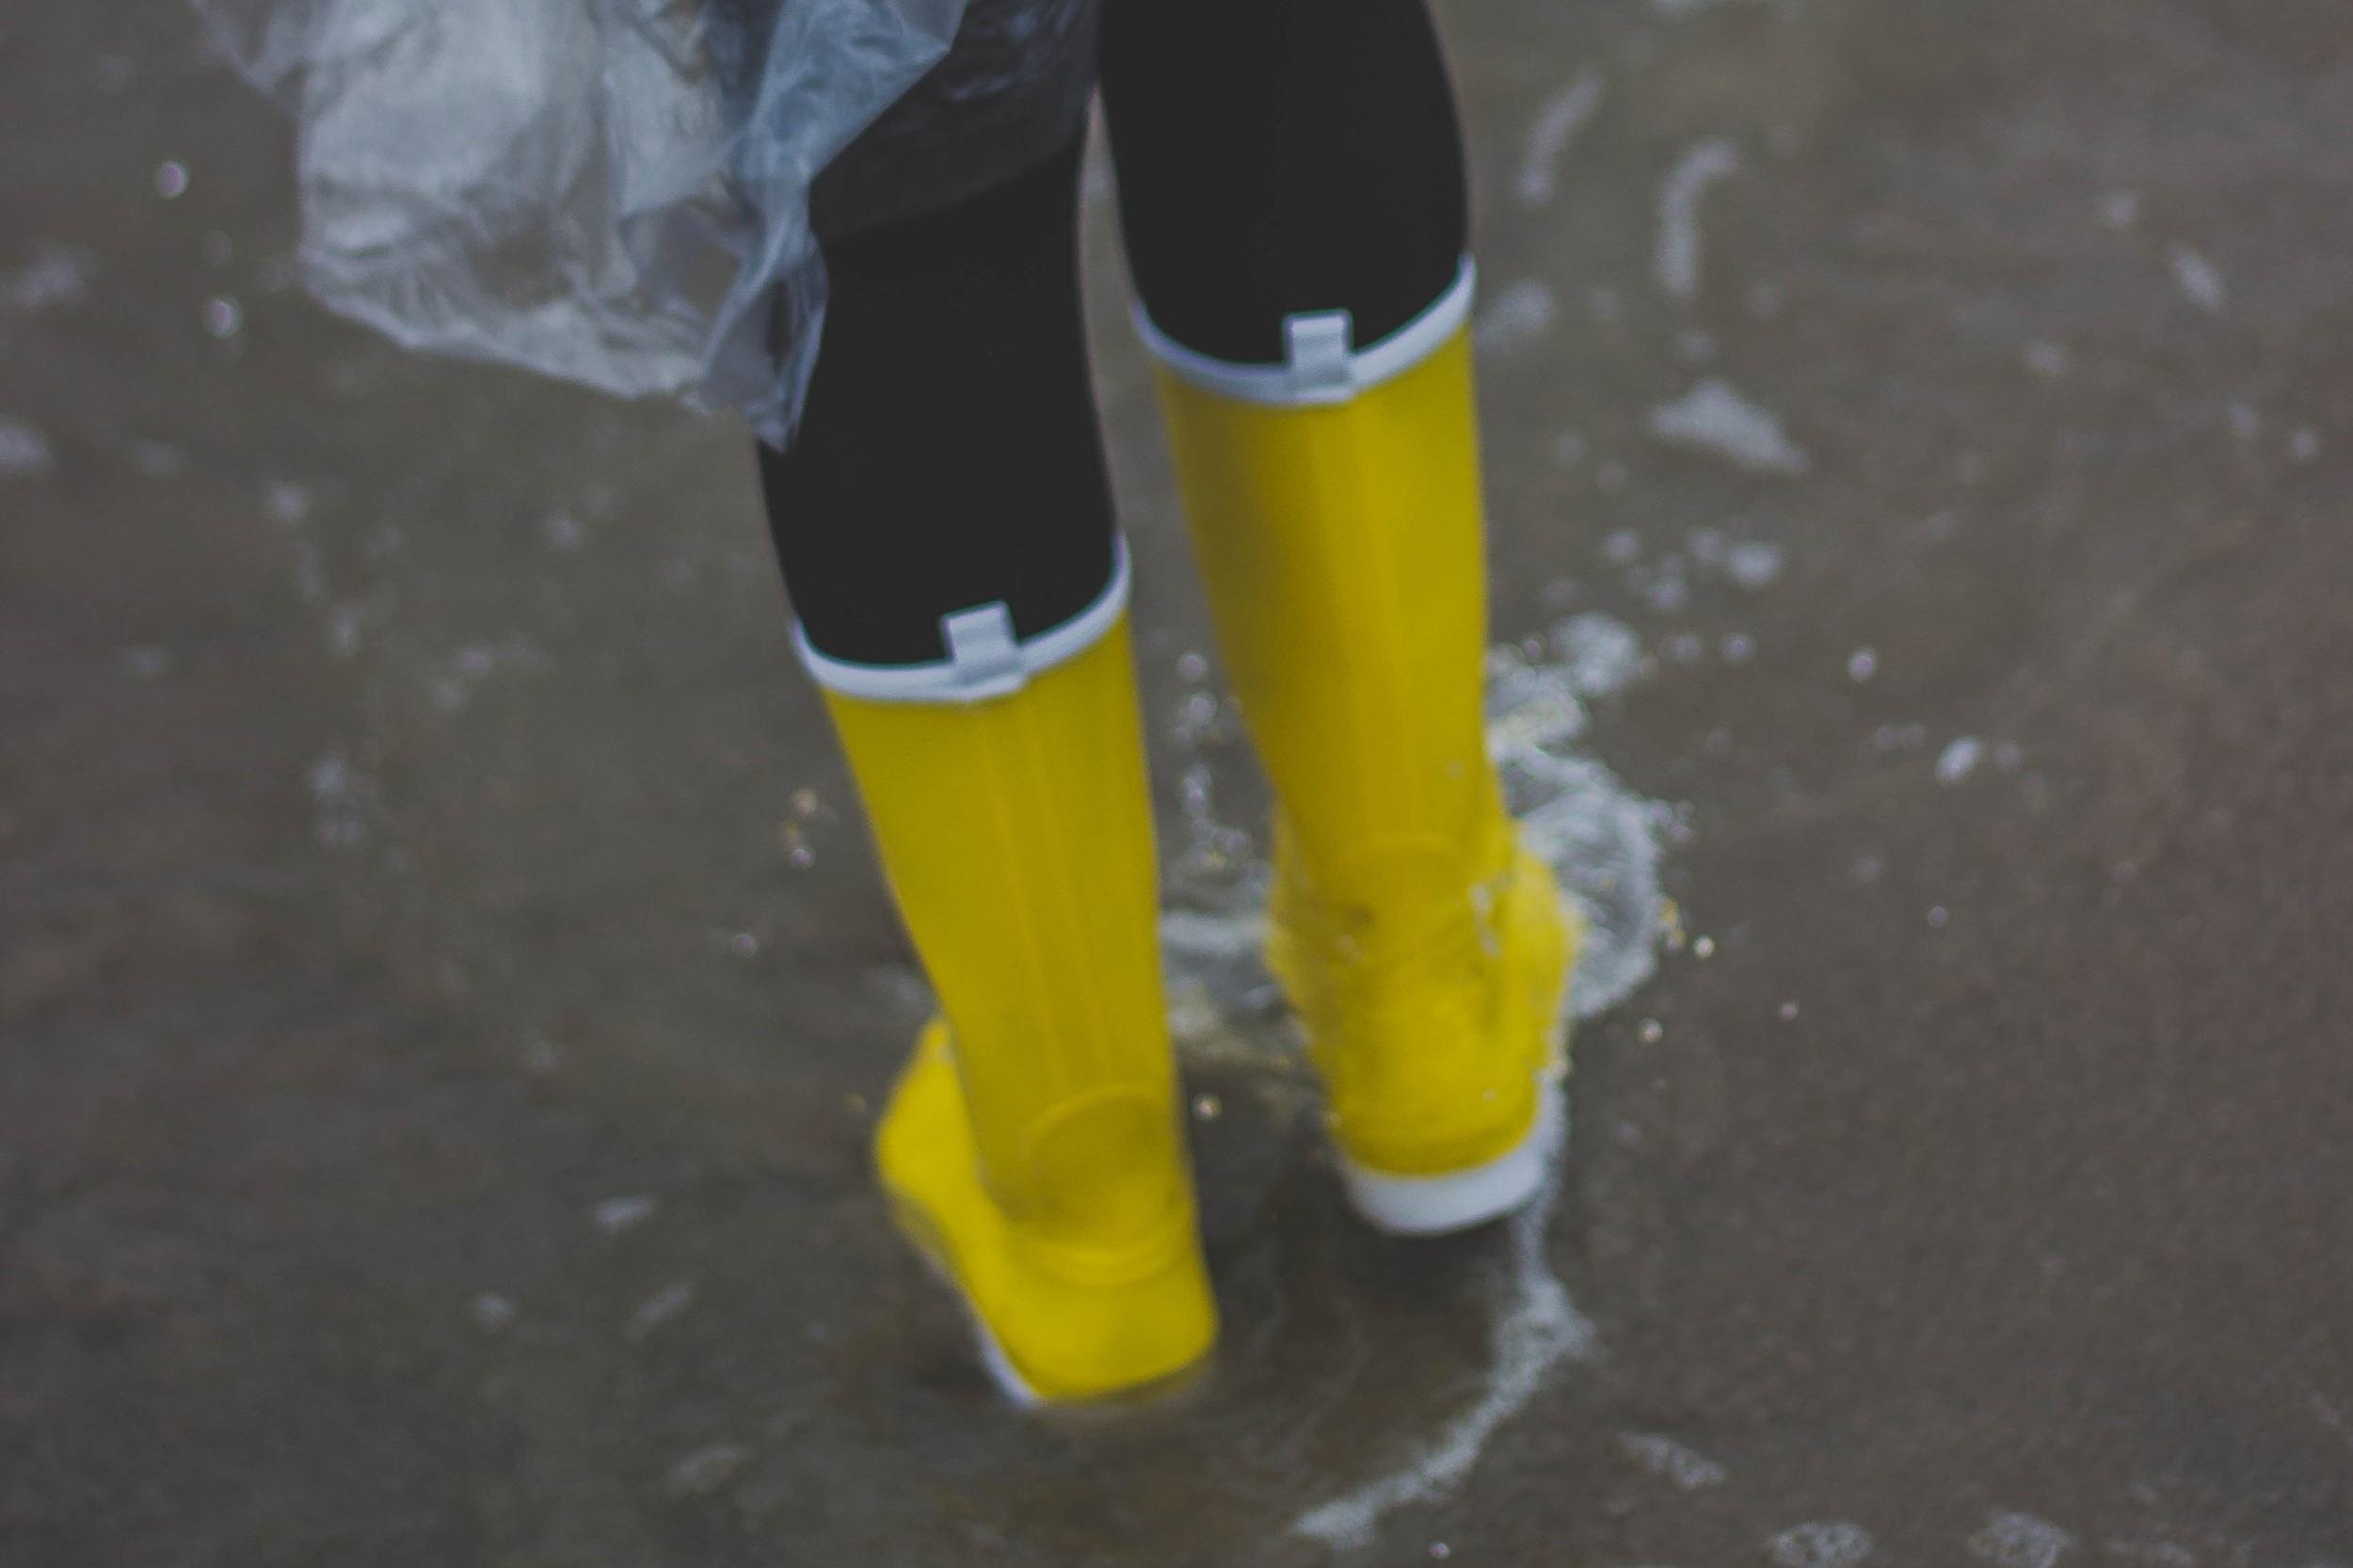 boots-environment-flood-724656.jpg